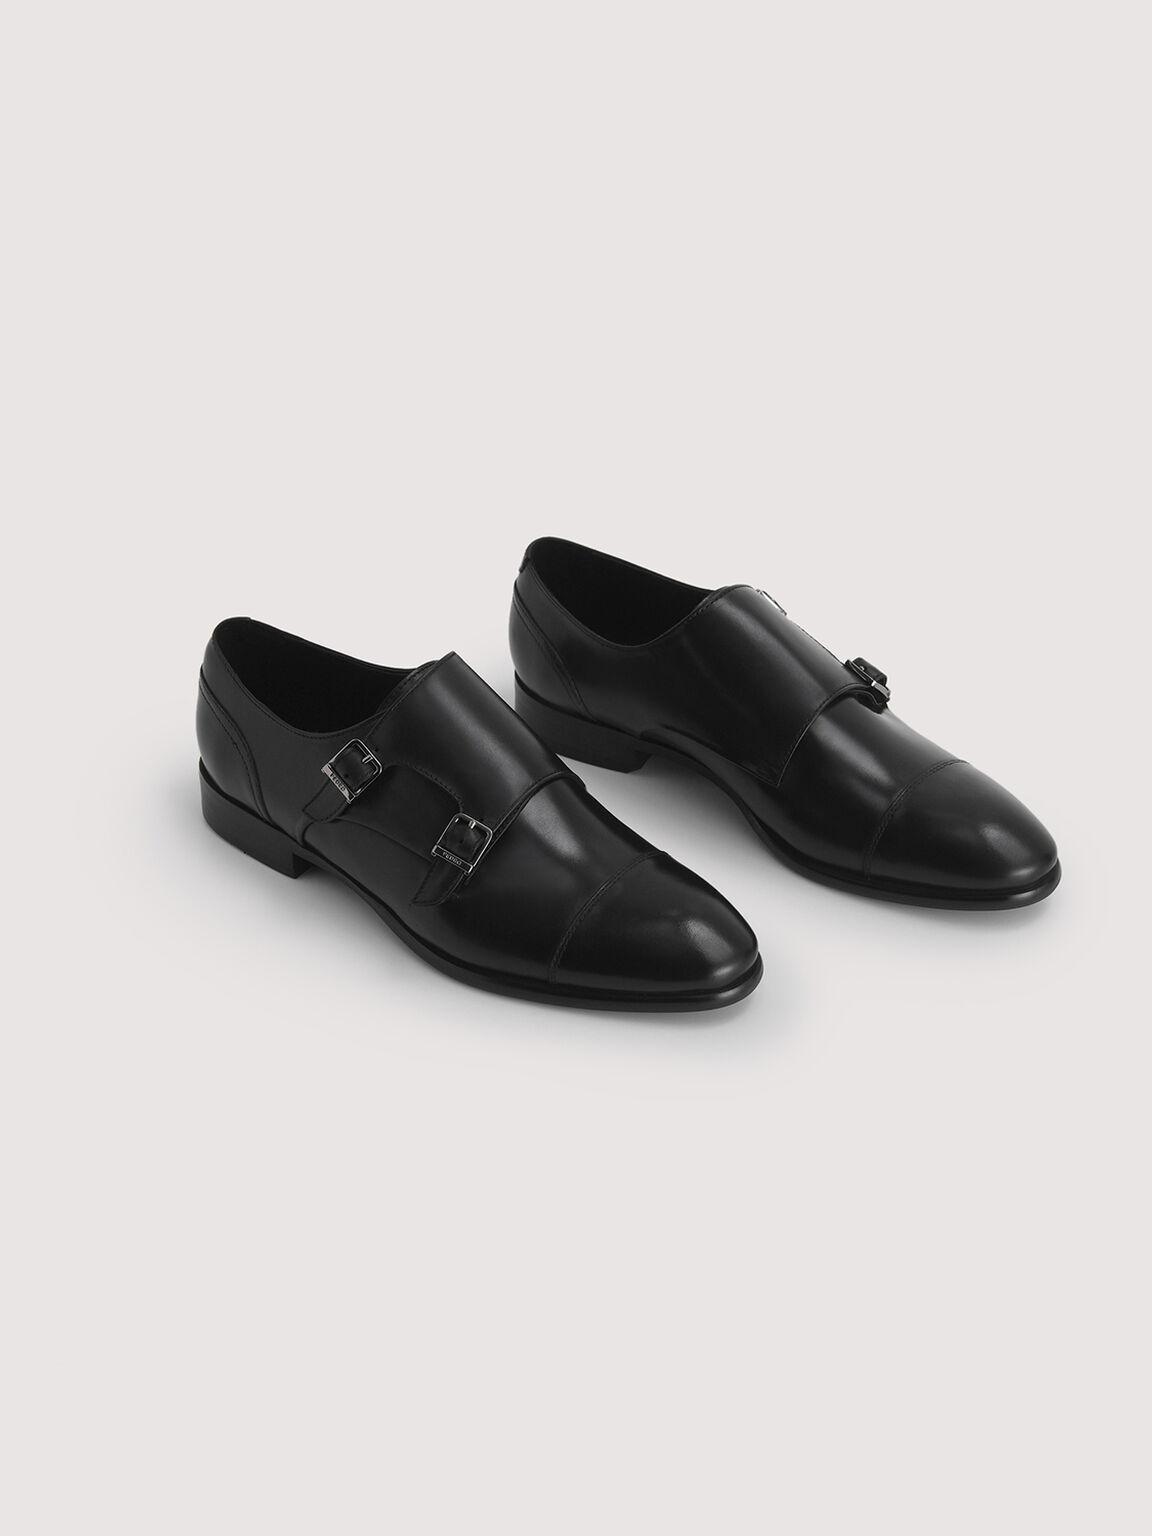 Leather Buckled Loafers, Black, hi-res